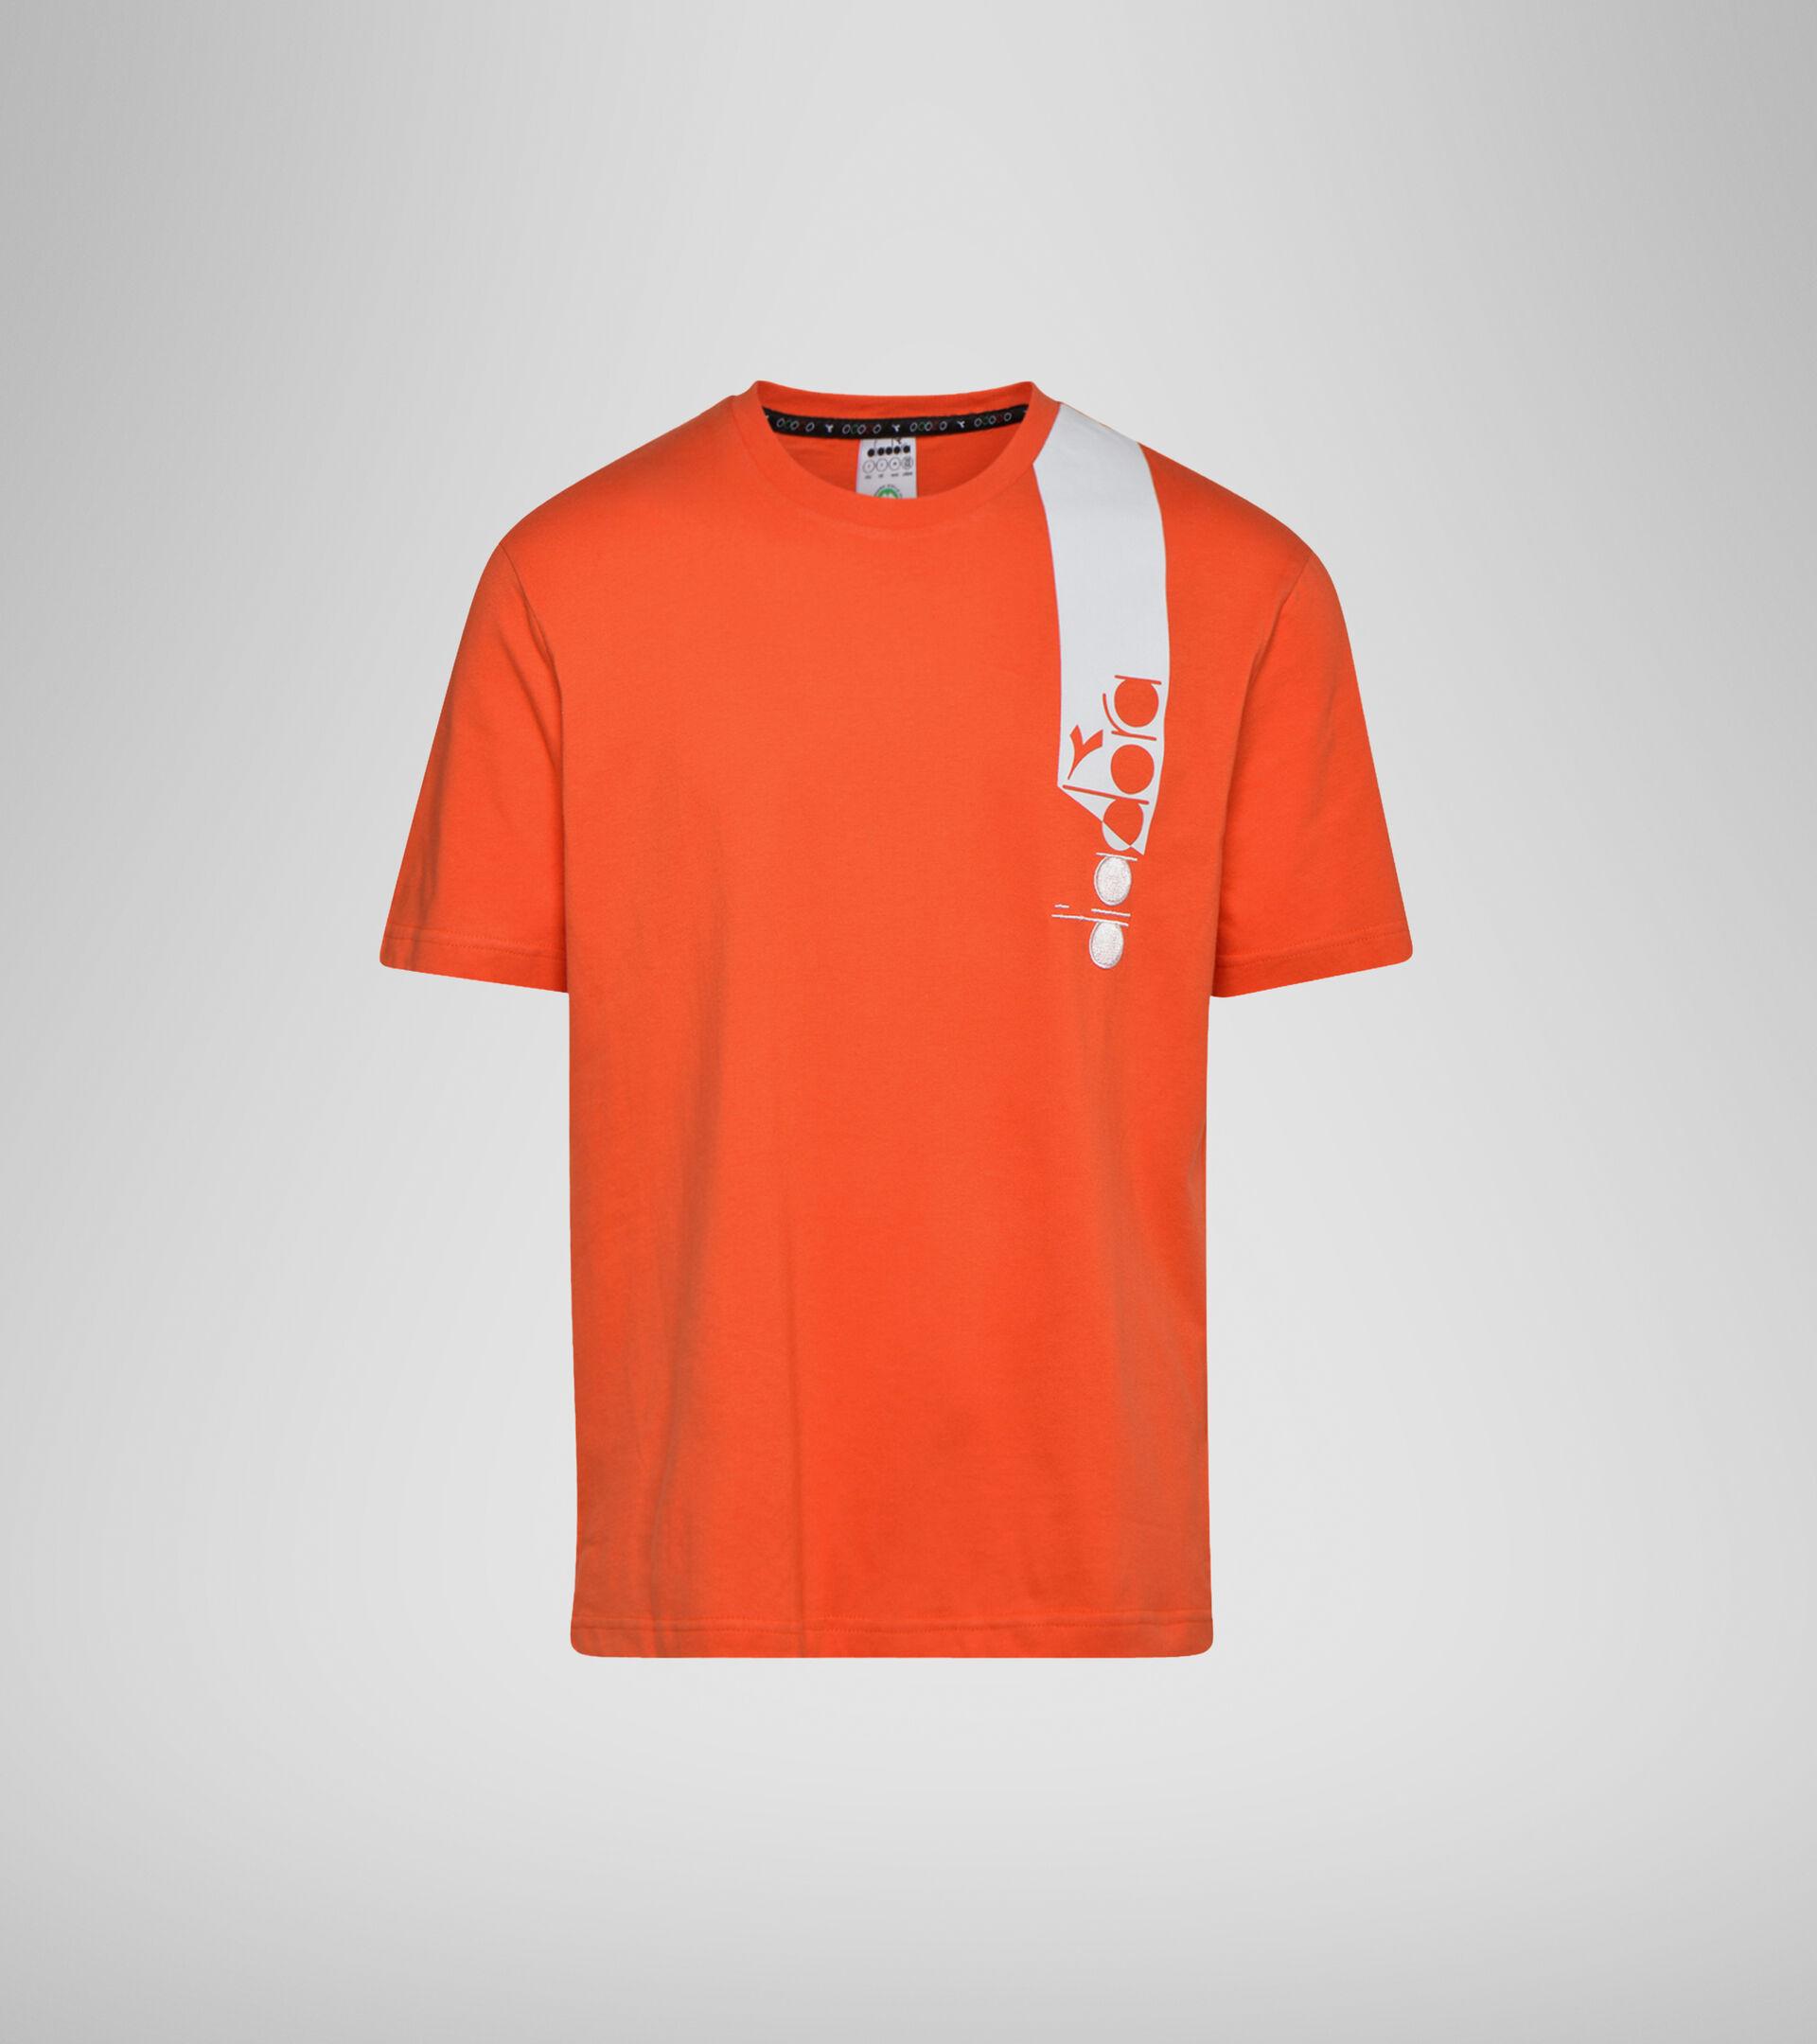 Apparel Sportswear UOMO T-SHIRT SS ICON ORANGEADE Diadora